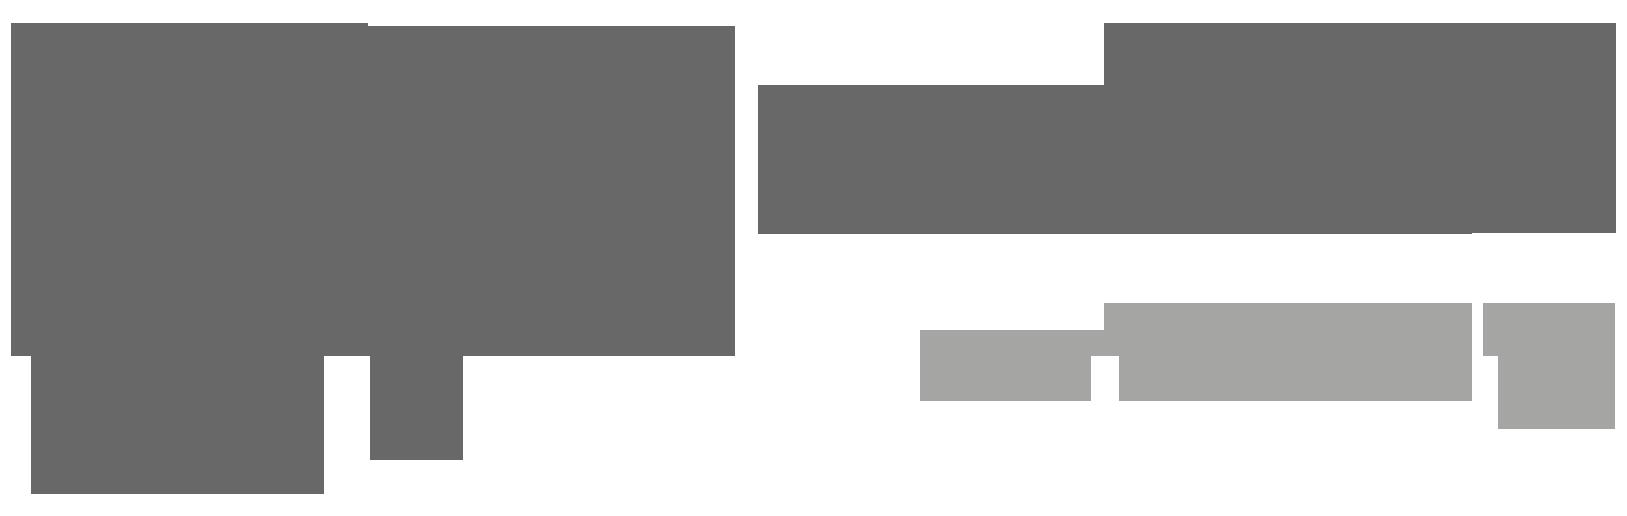 ClearOS-community-logo-horiz